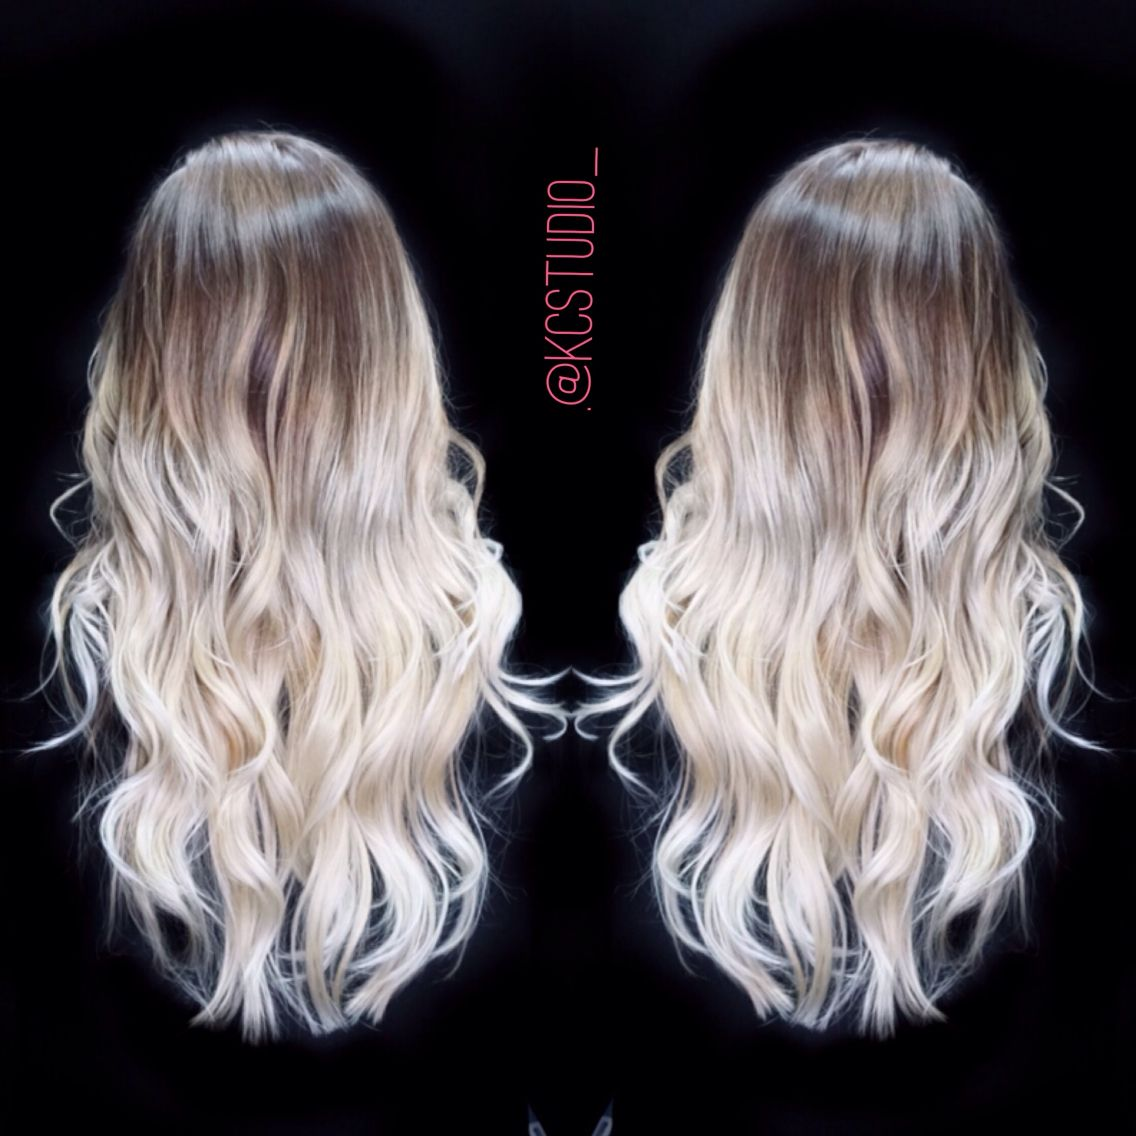 icy blonde ombre hair color kc studio hair pinterest. Black Bedroom Furniture Sets. Home Design Ideas